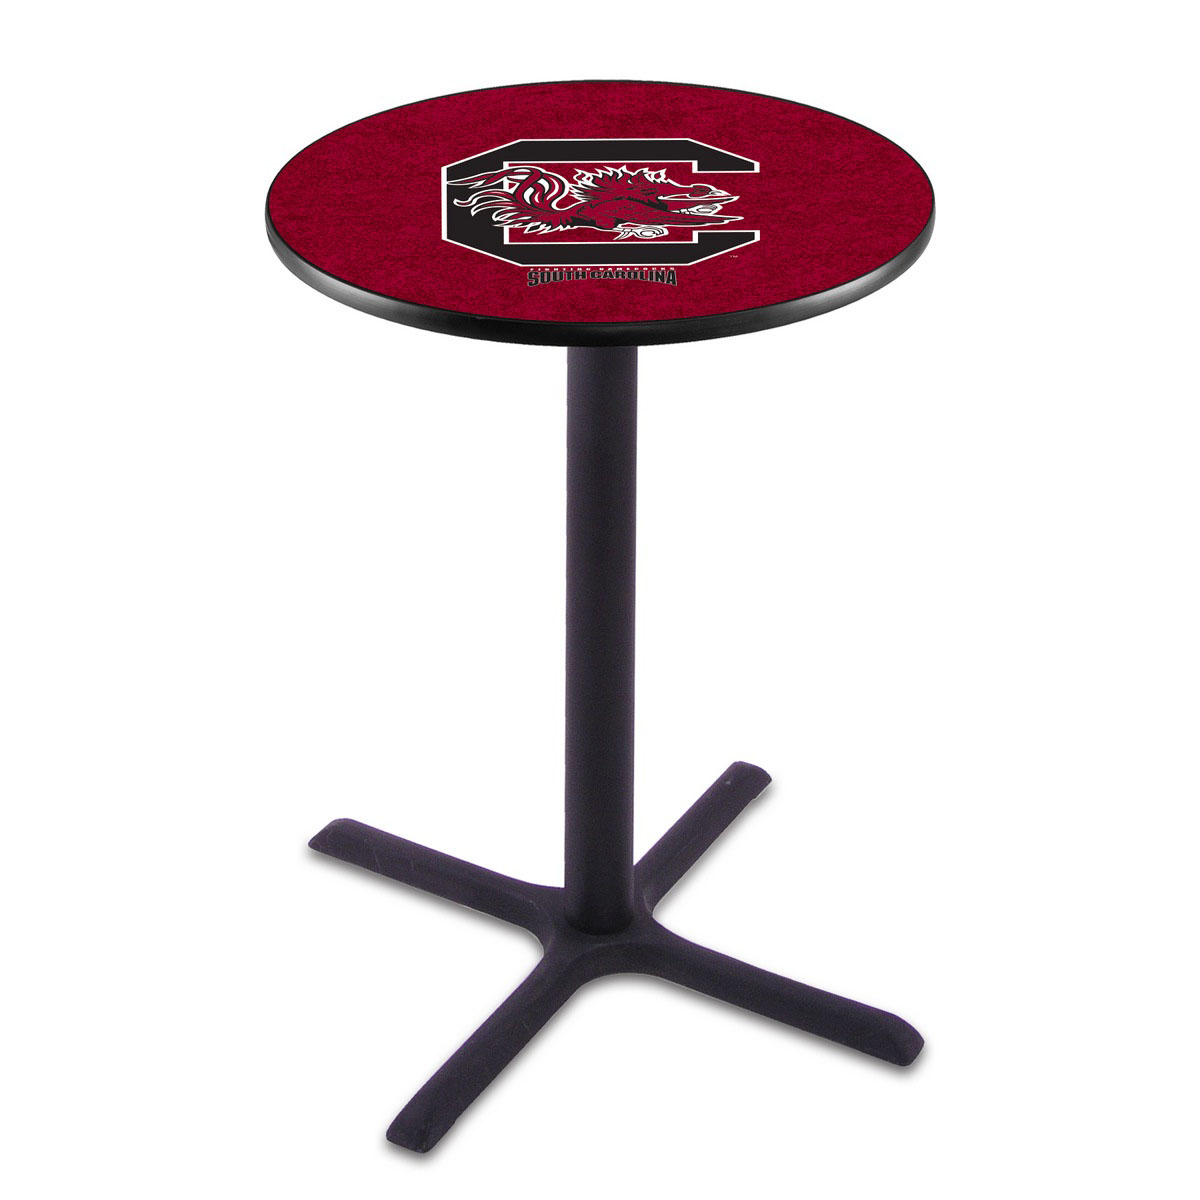 Popular South Carolina Wrinkle Pub Table Product Photo